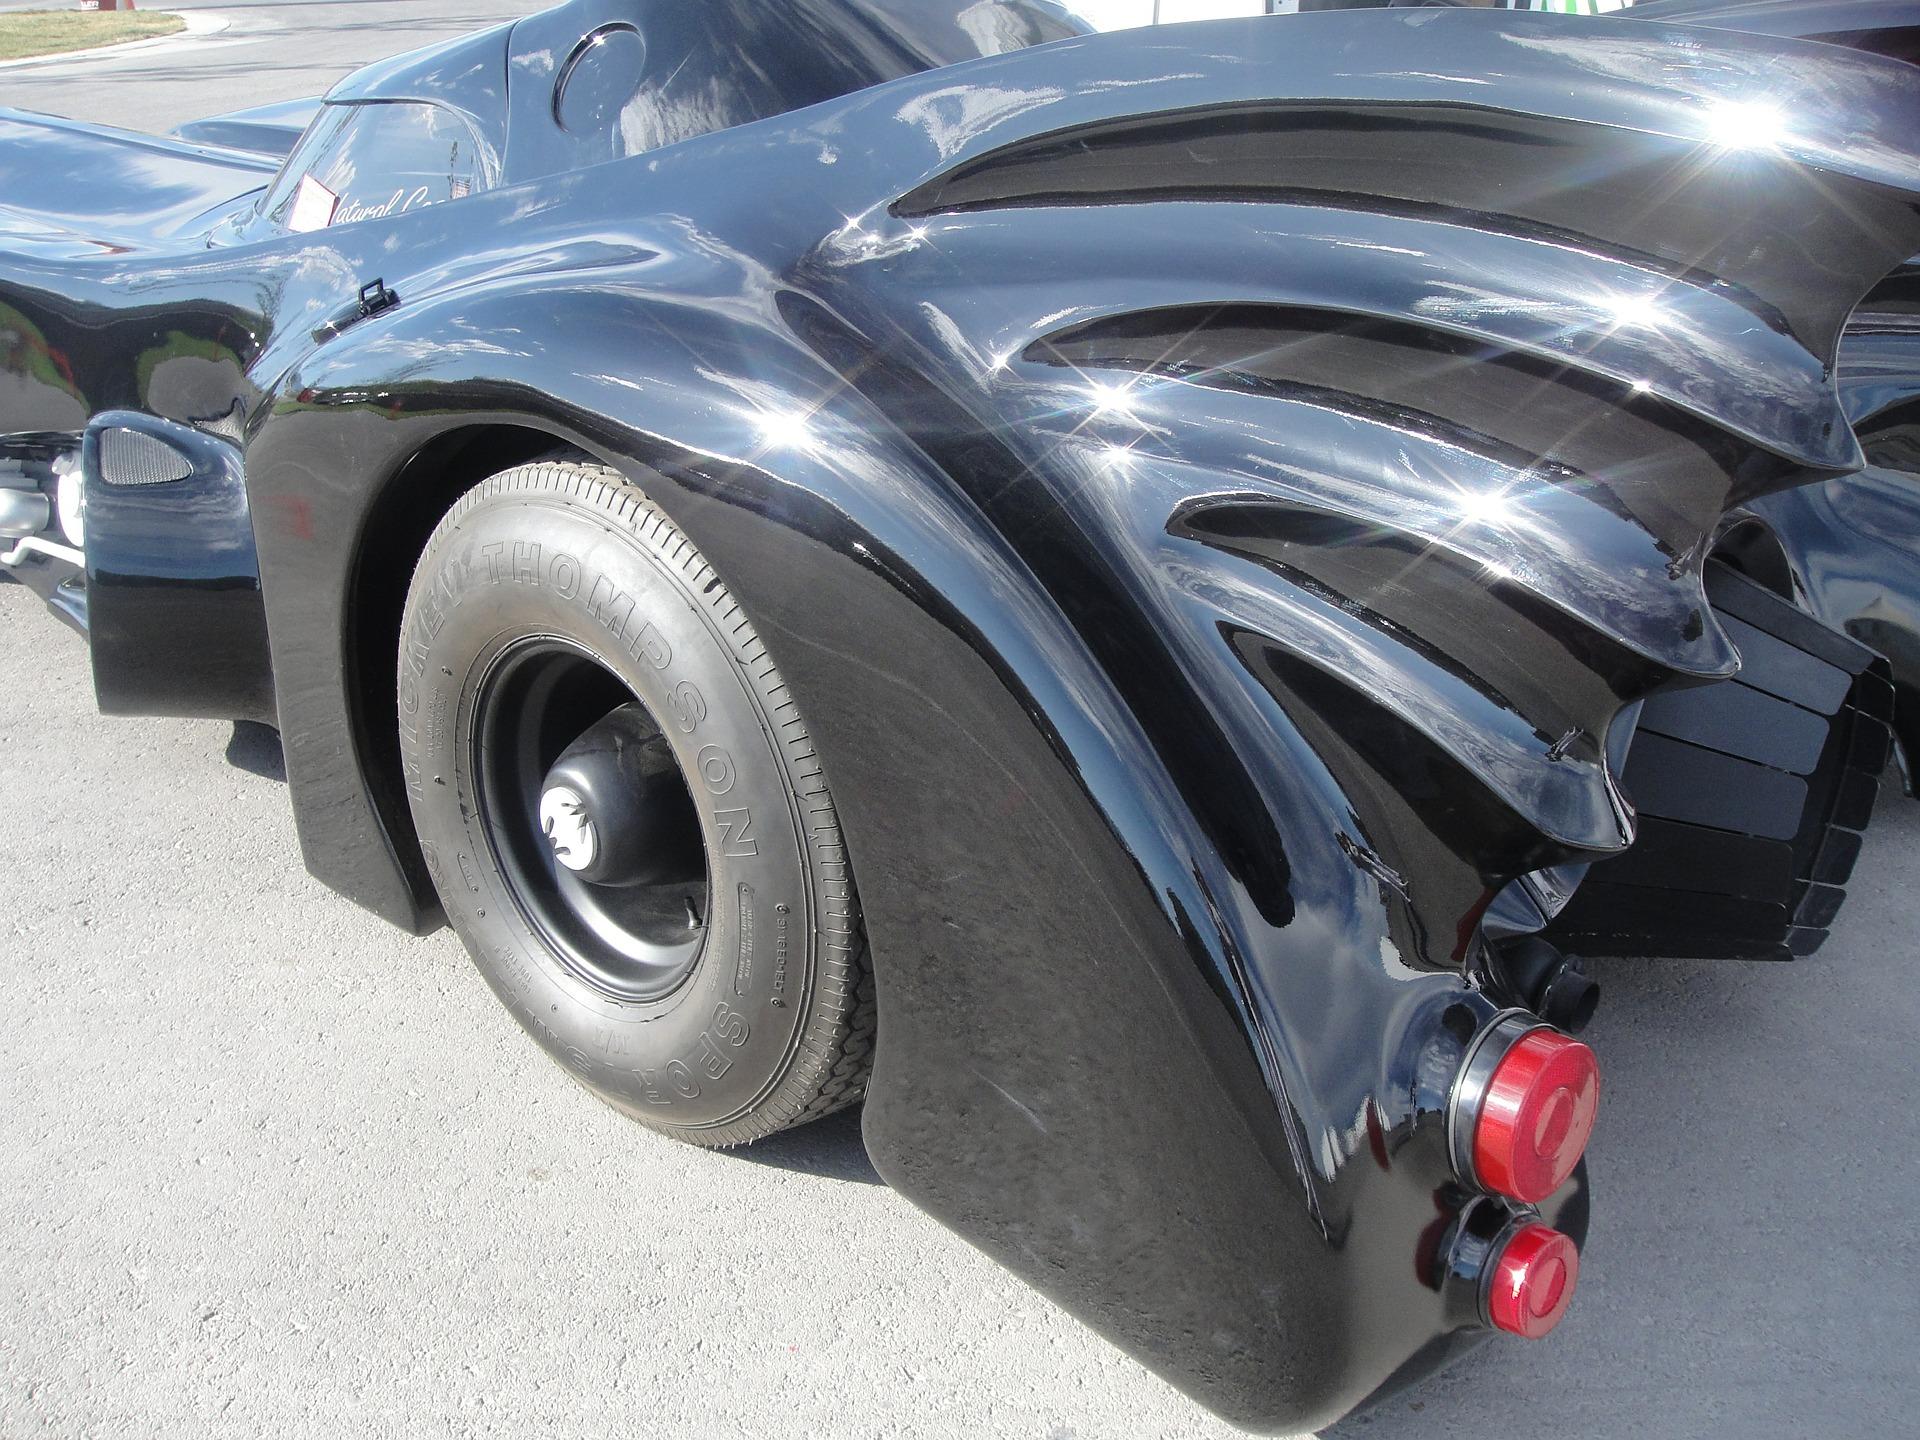 Batman Car (Bat Mobile)